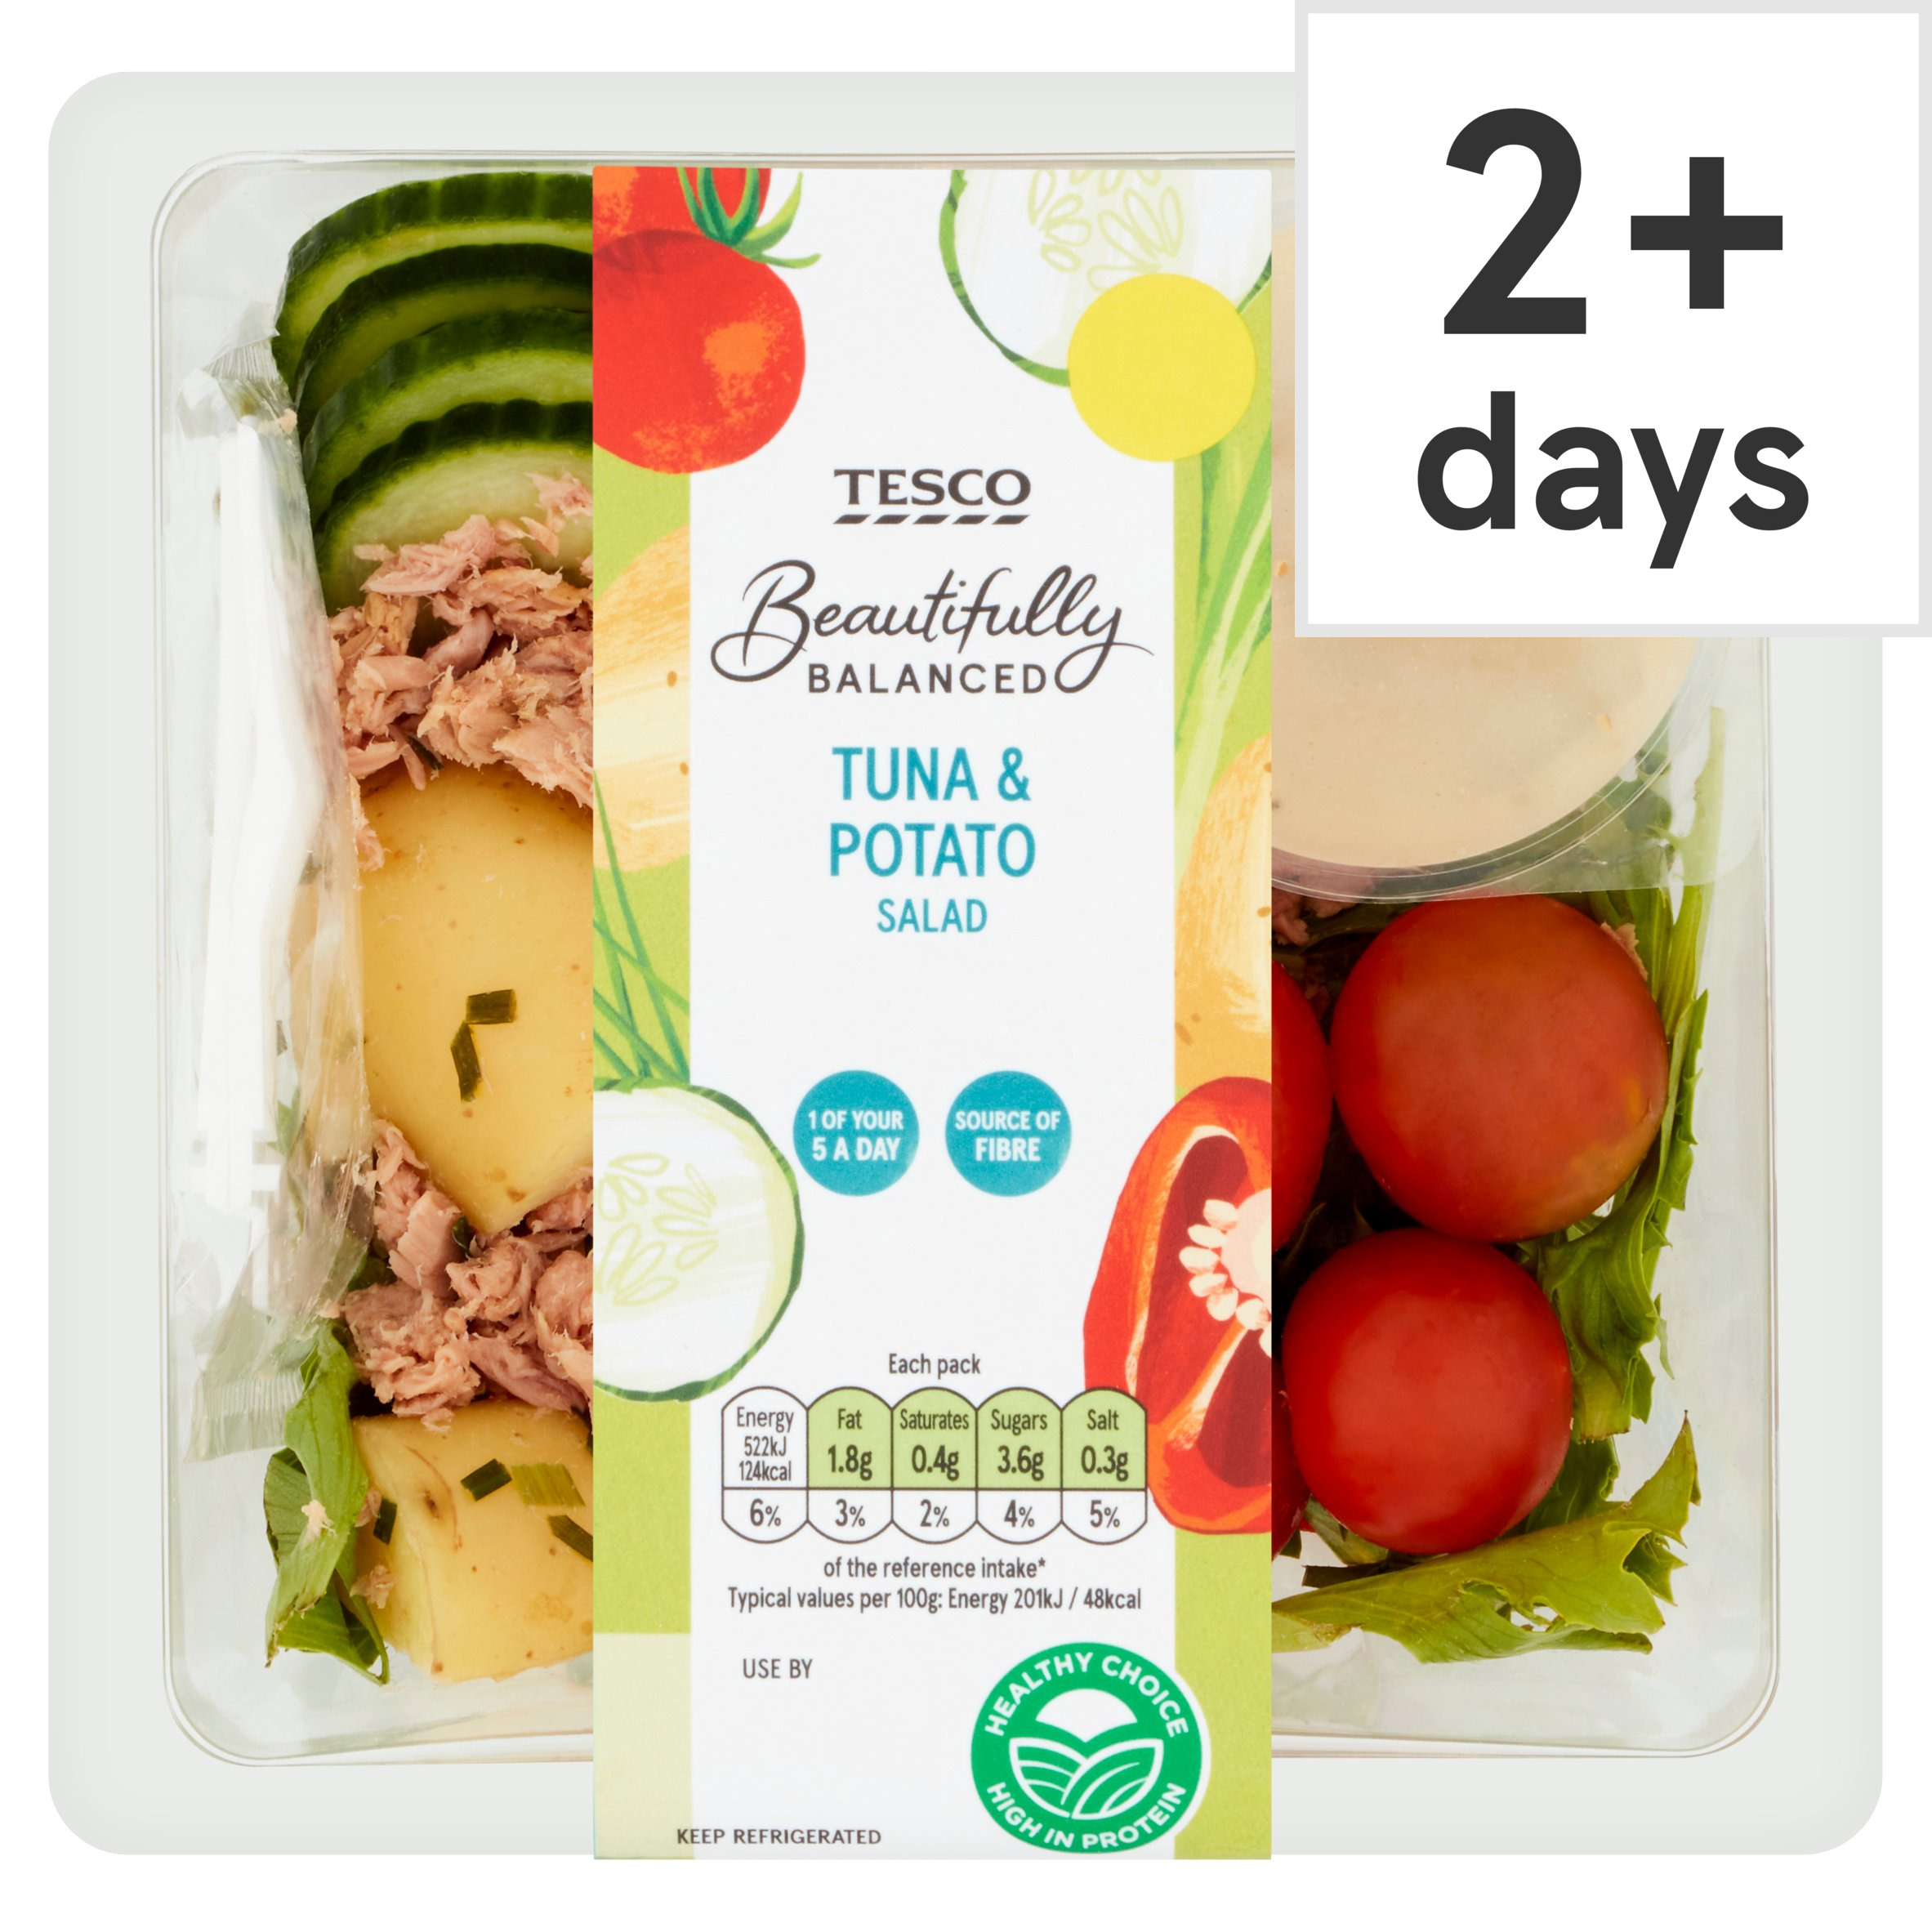 Tesco Beautifully Balanced Tuna & Potato Salad 260G